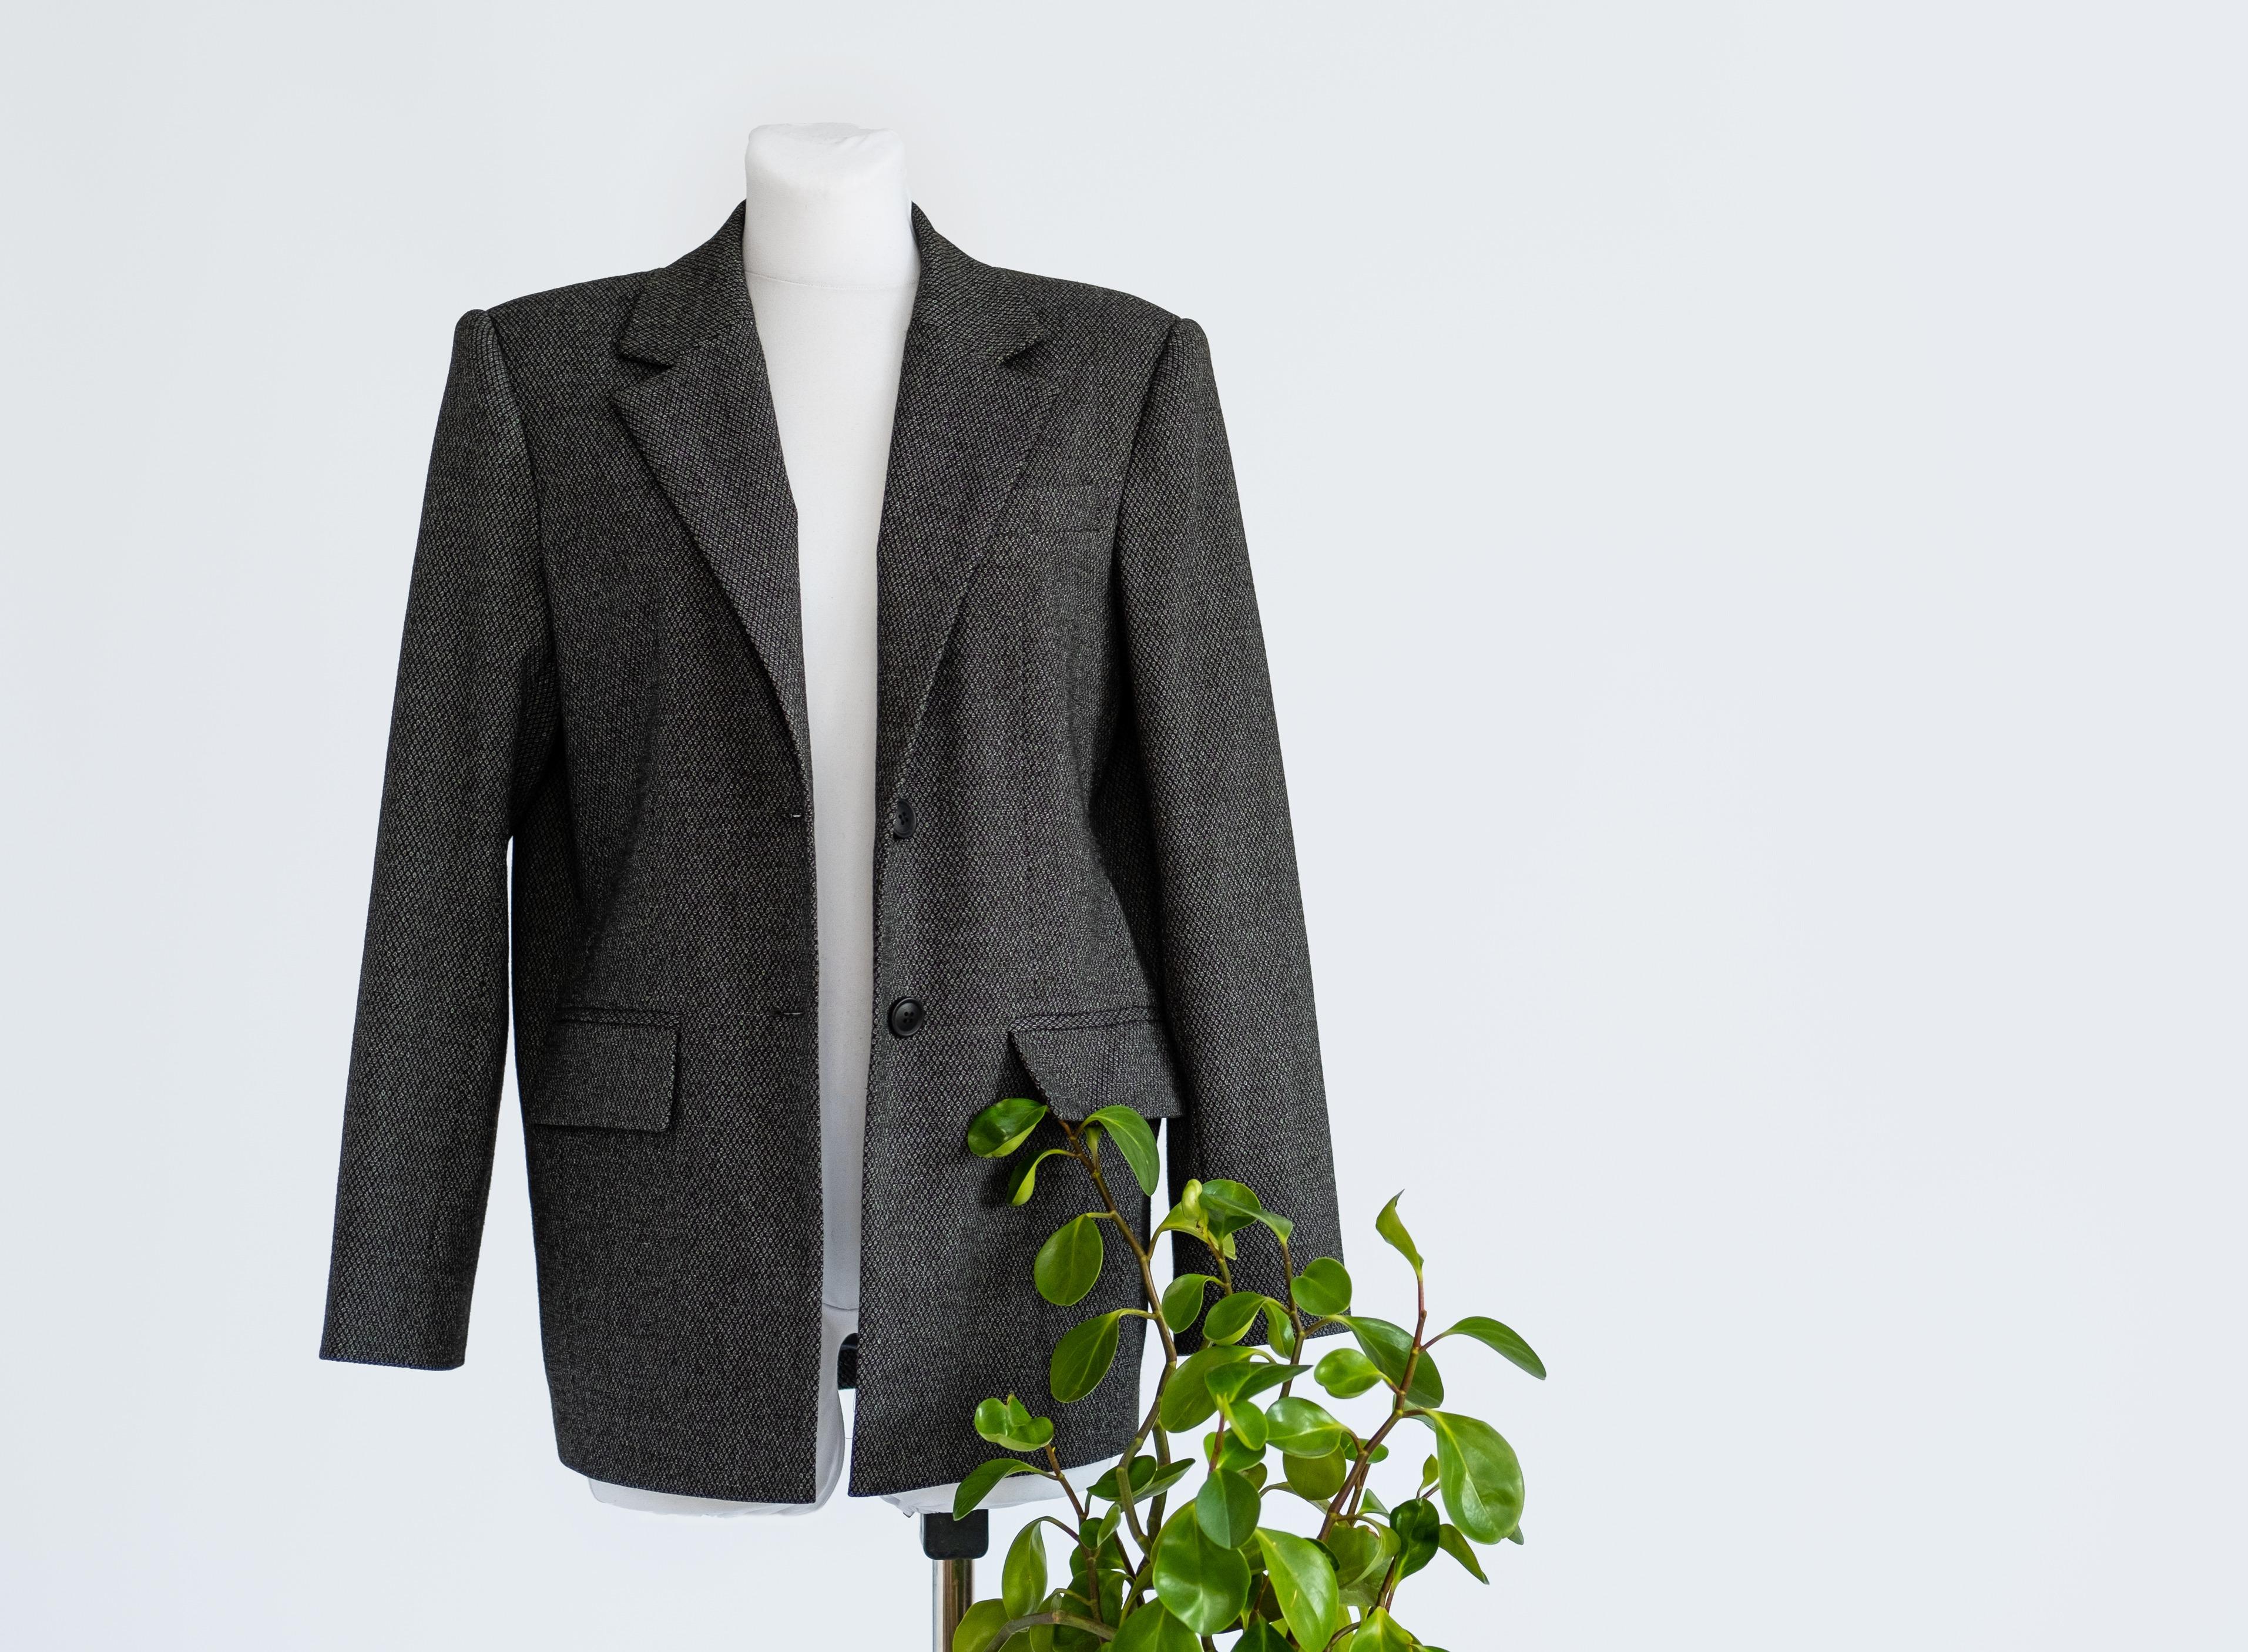 sustainable-fashion-organic-clothes-eco-clothing-e-WFEB5VZ